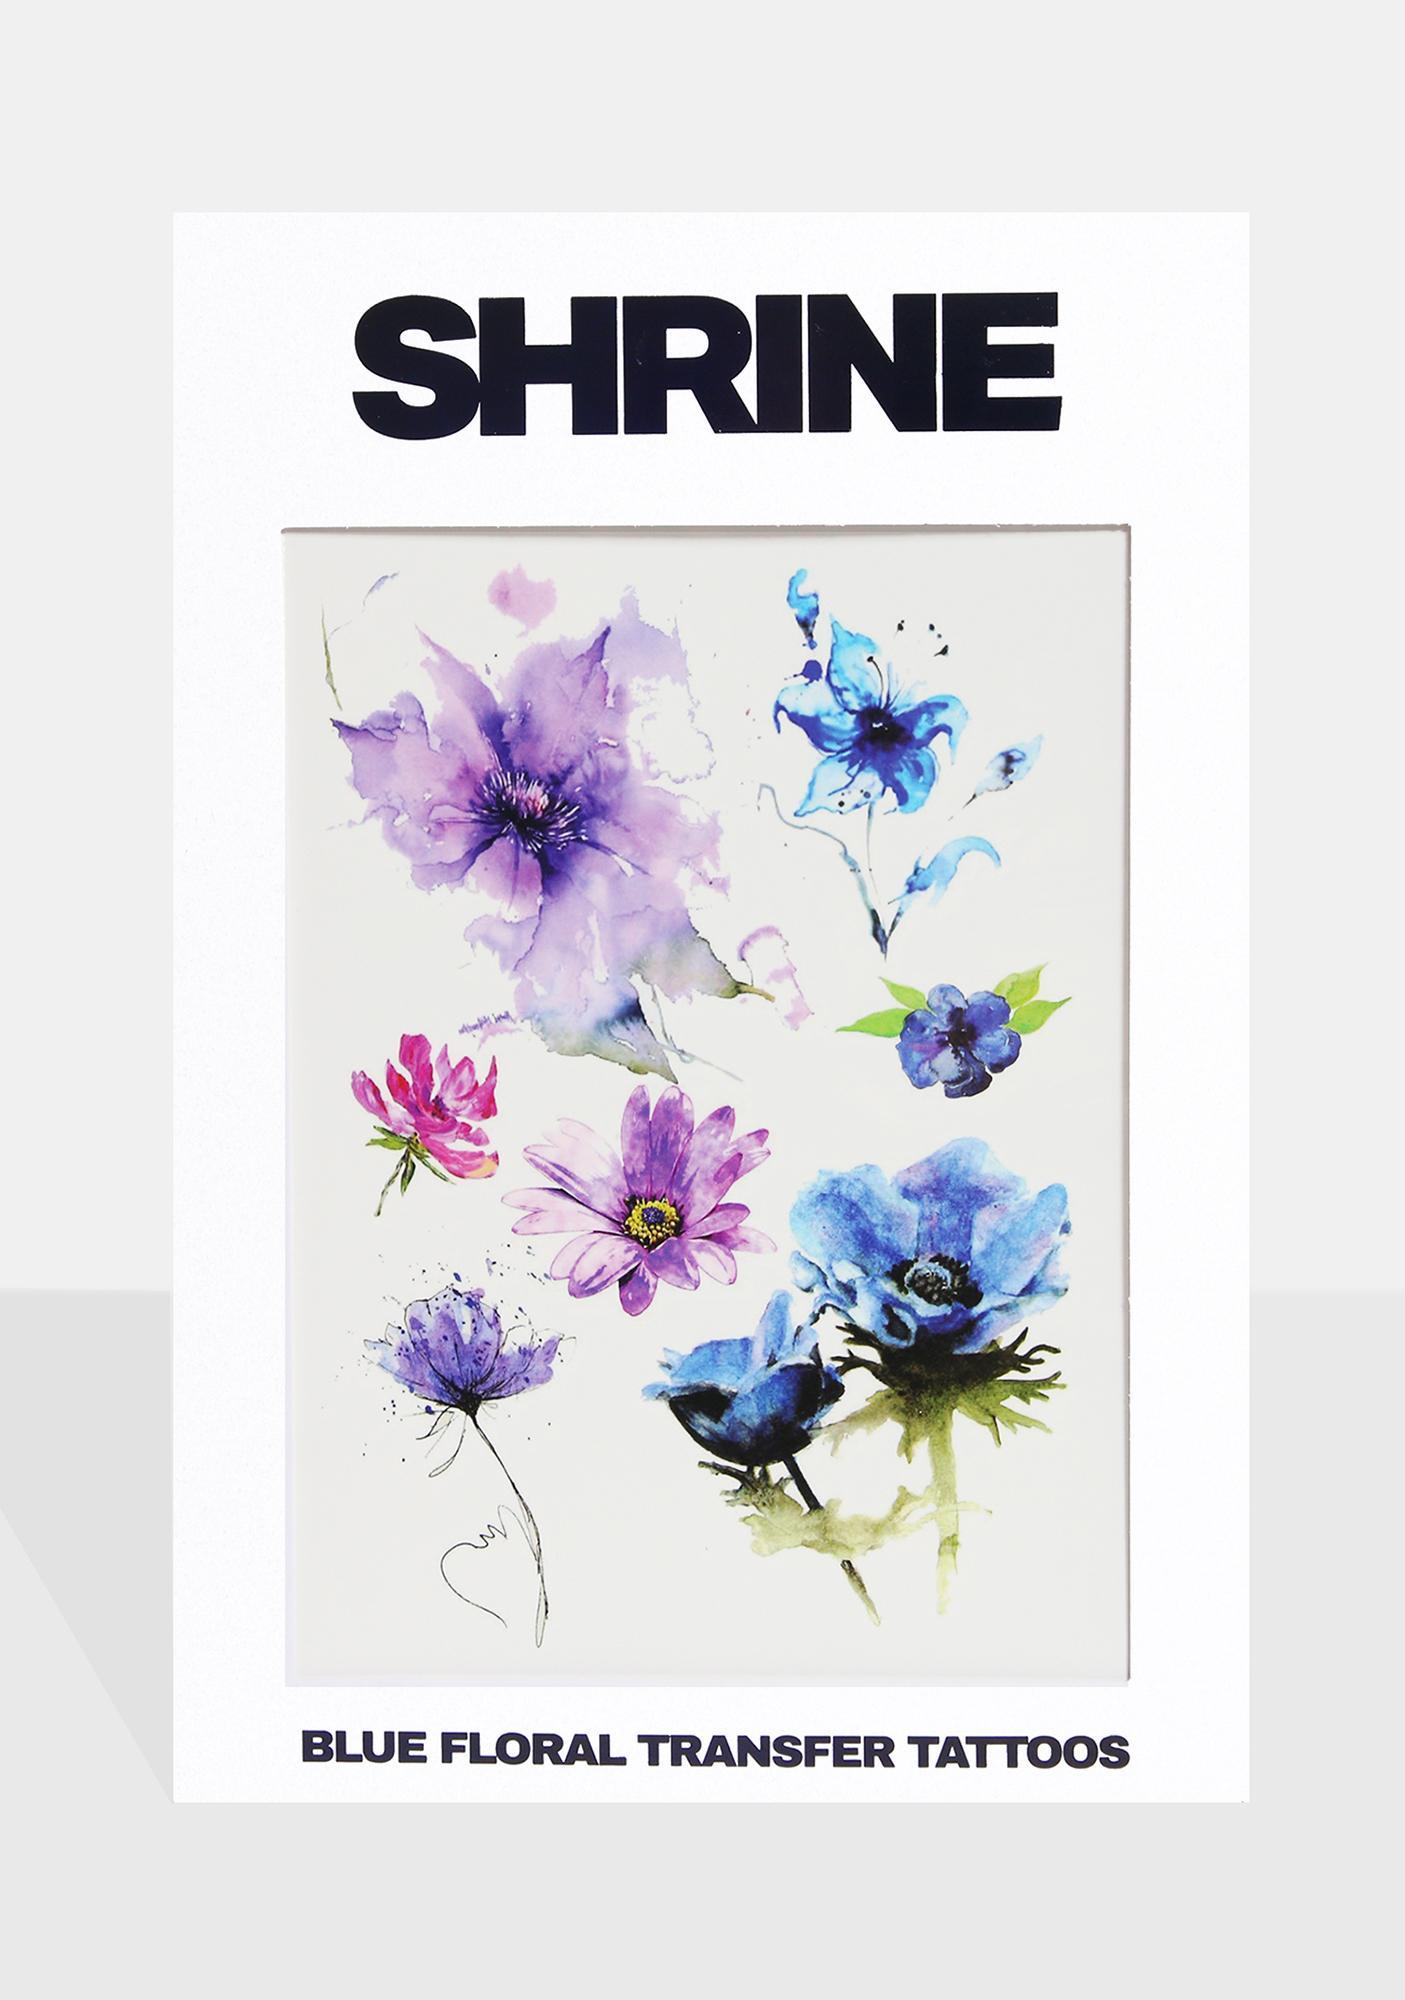 SHRINE Blue Floral Transfer Tattoos